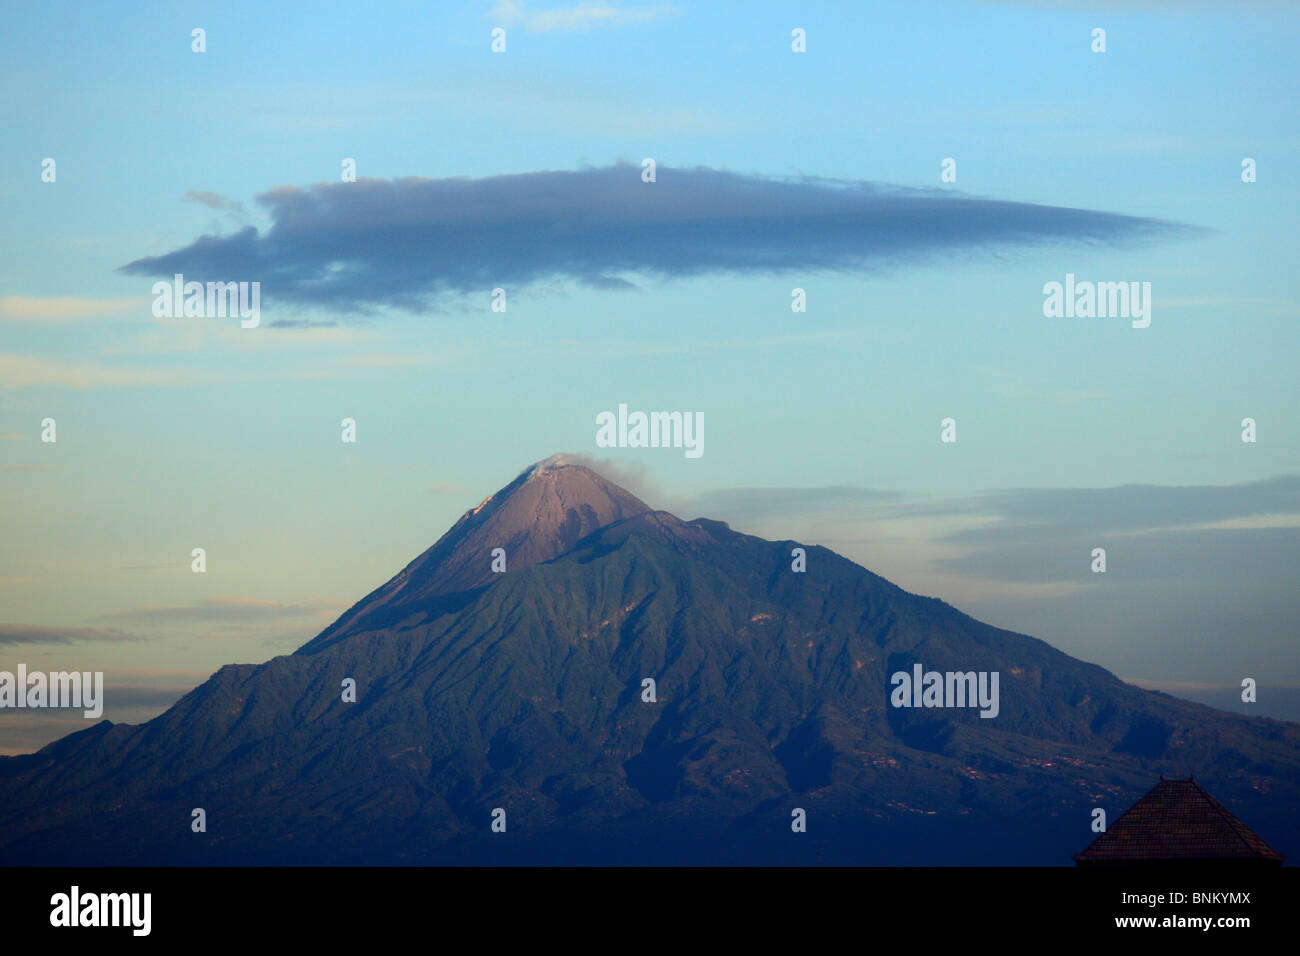 Indonesia, Java, Gunung Merapi volcano; - Stock Image